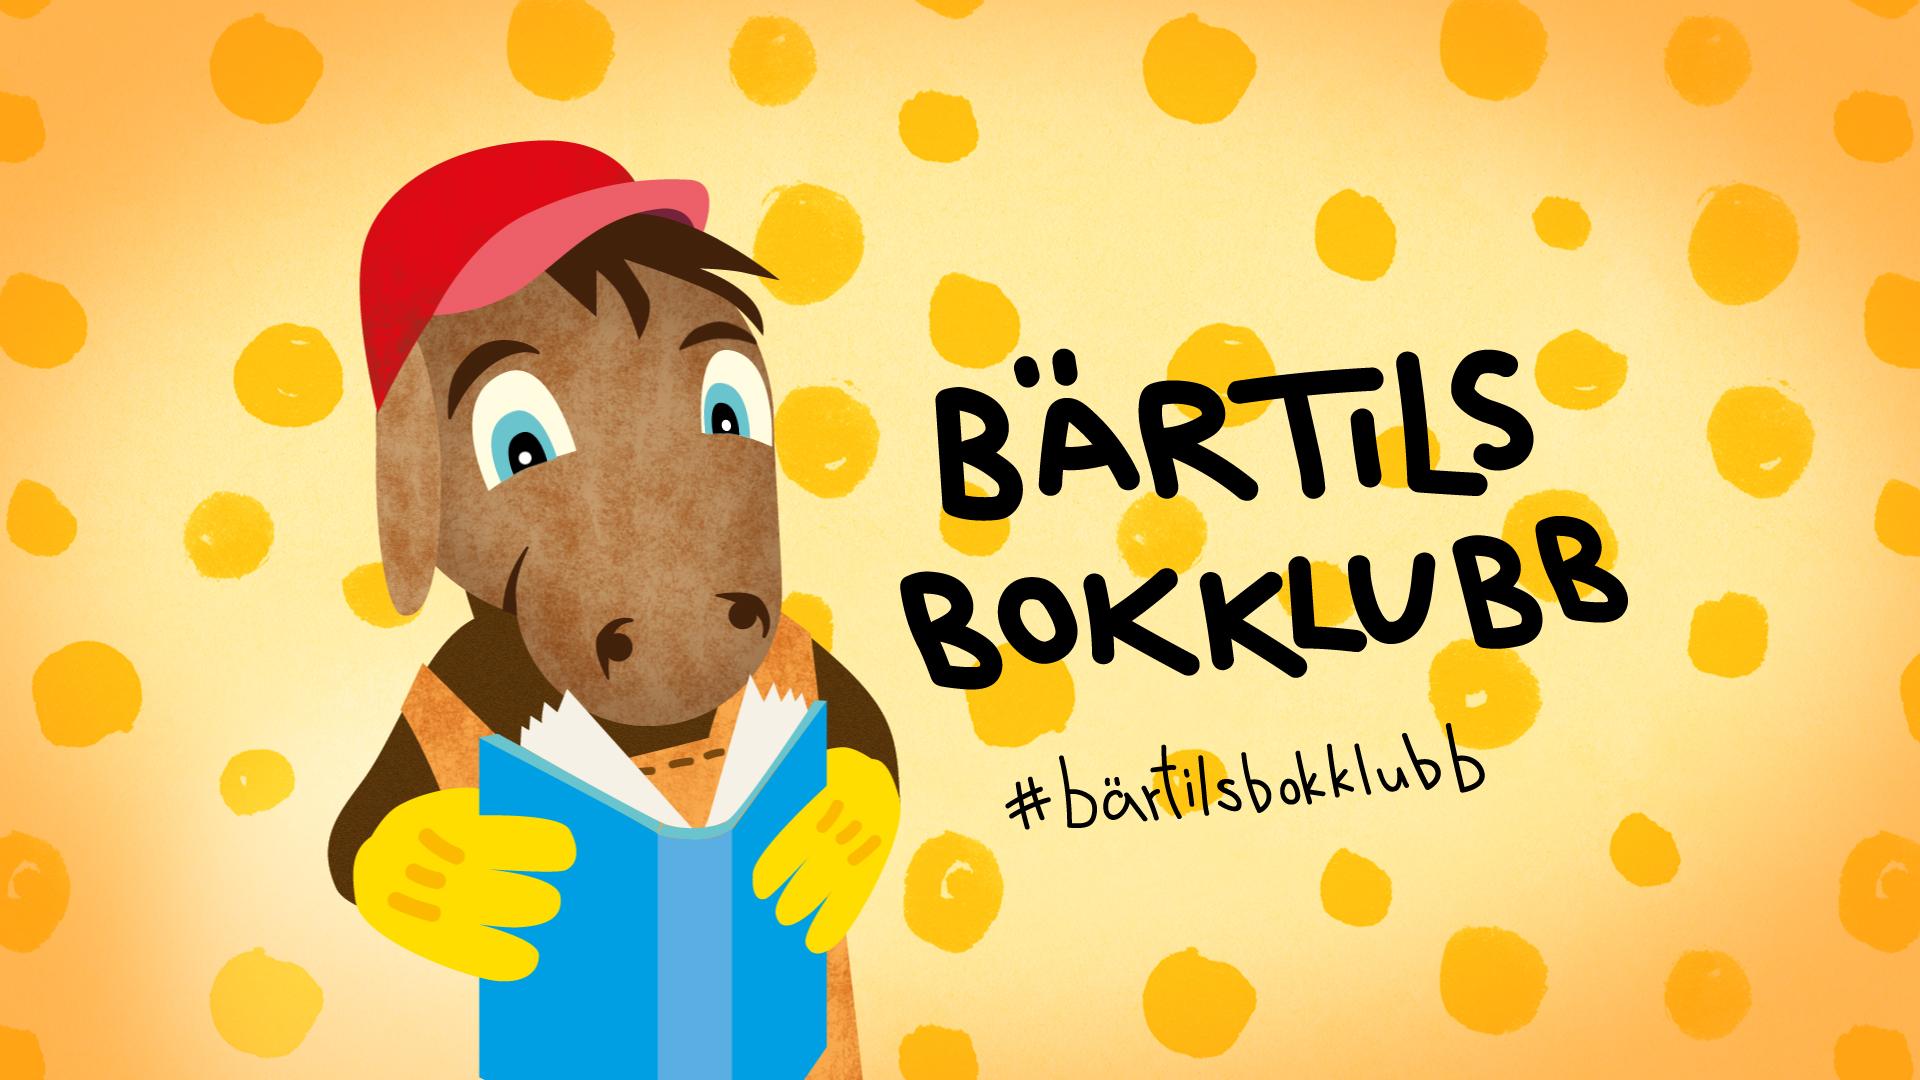 Bartilsbokklubb_jingle_stillmaster.jpg